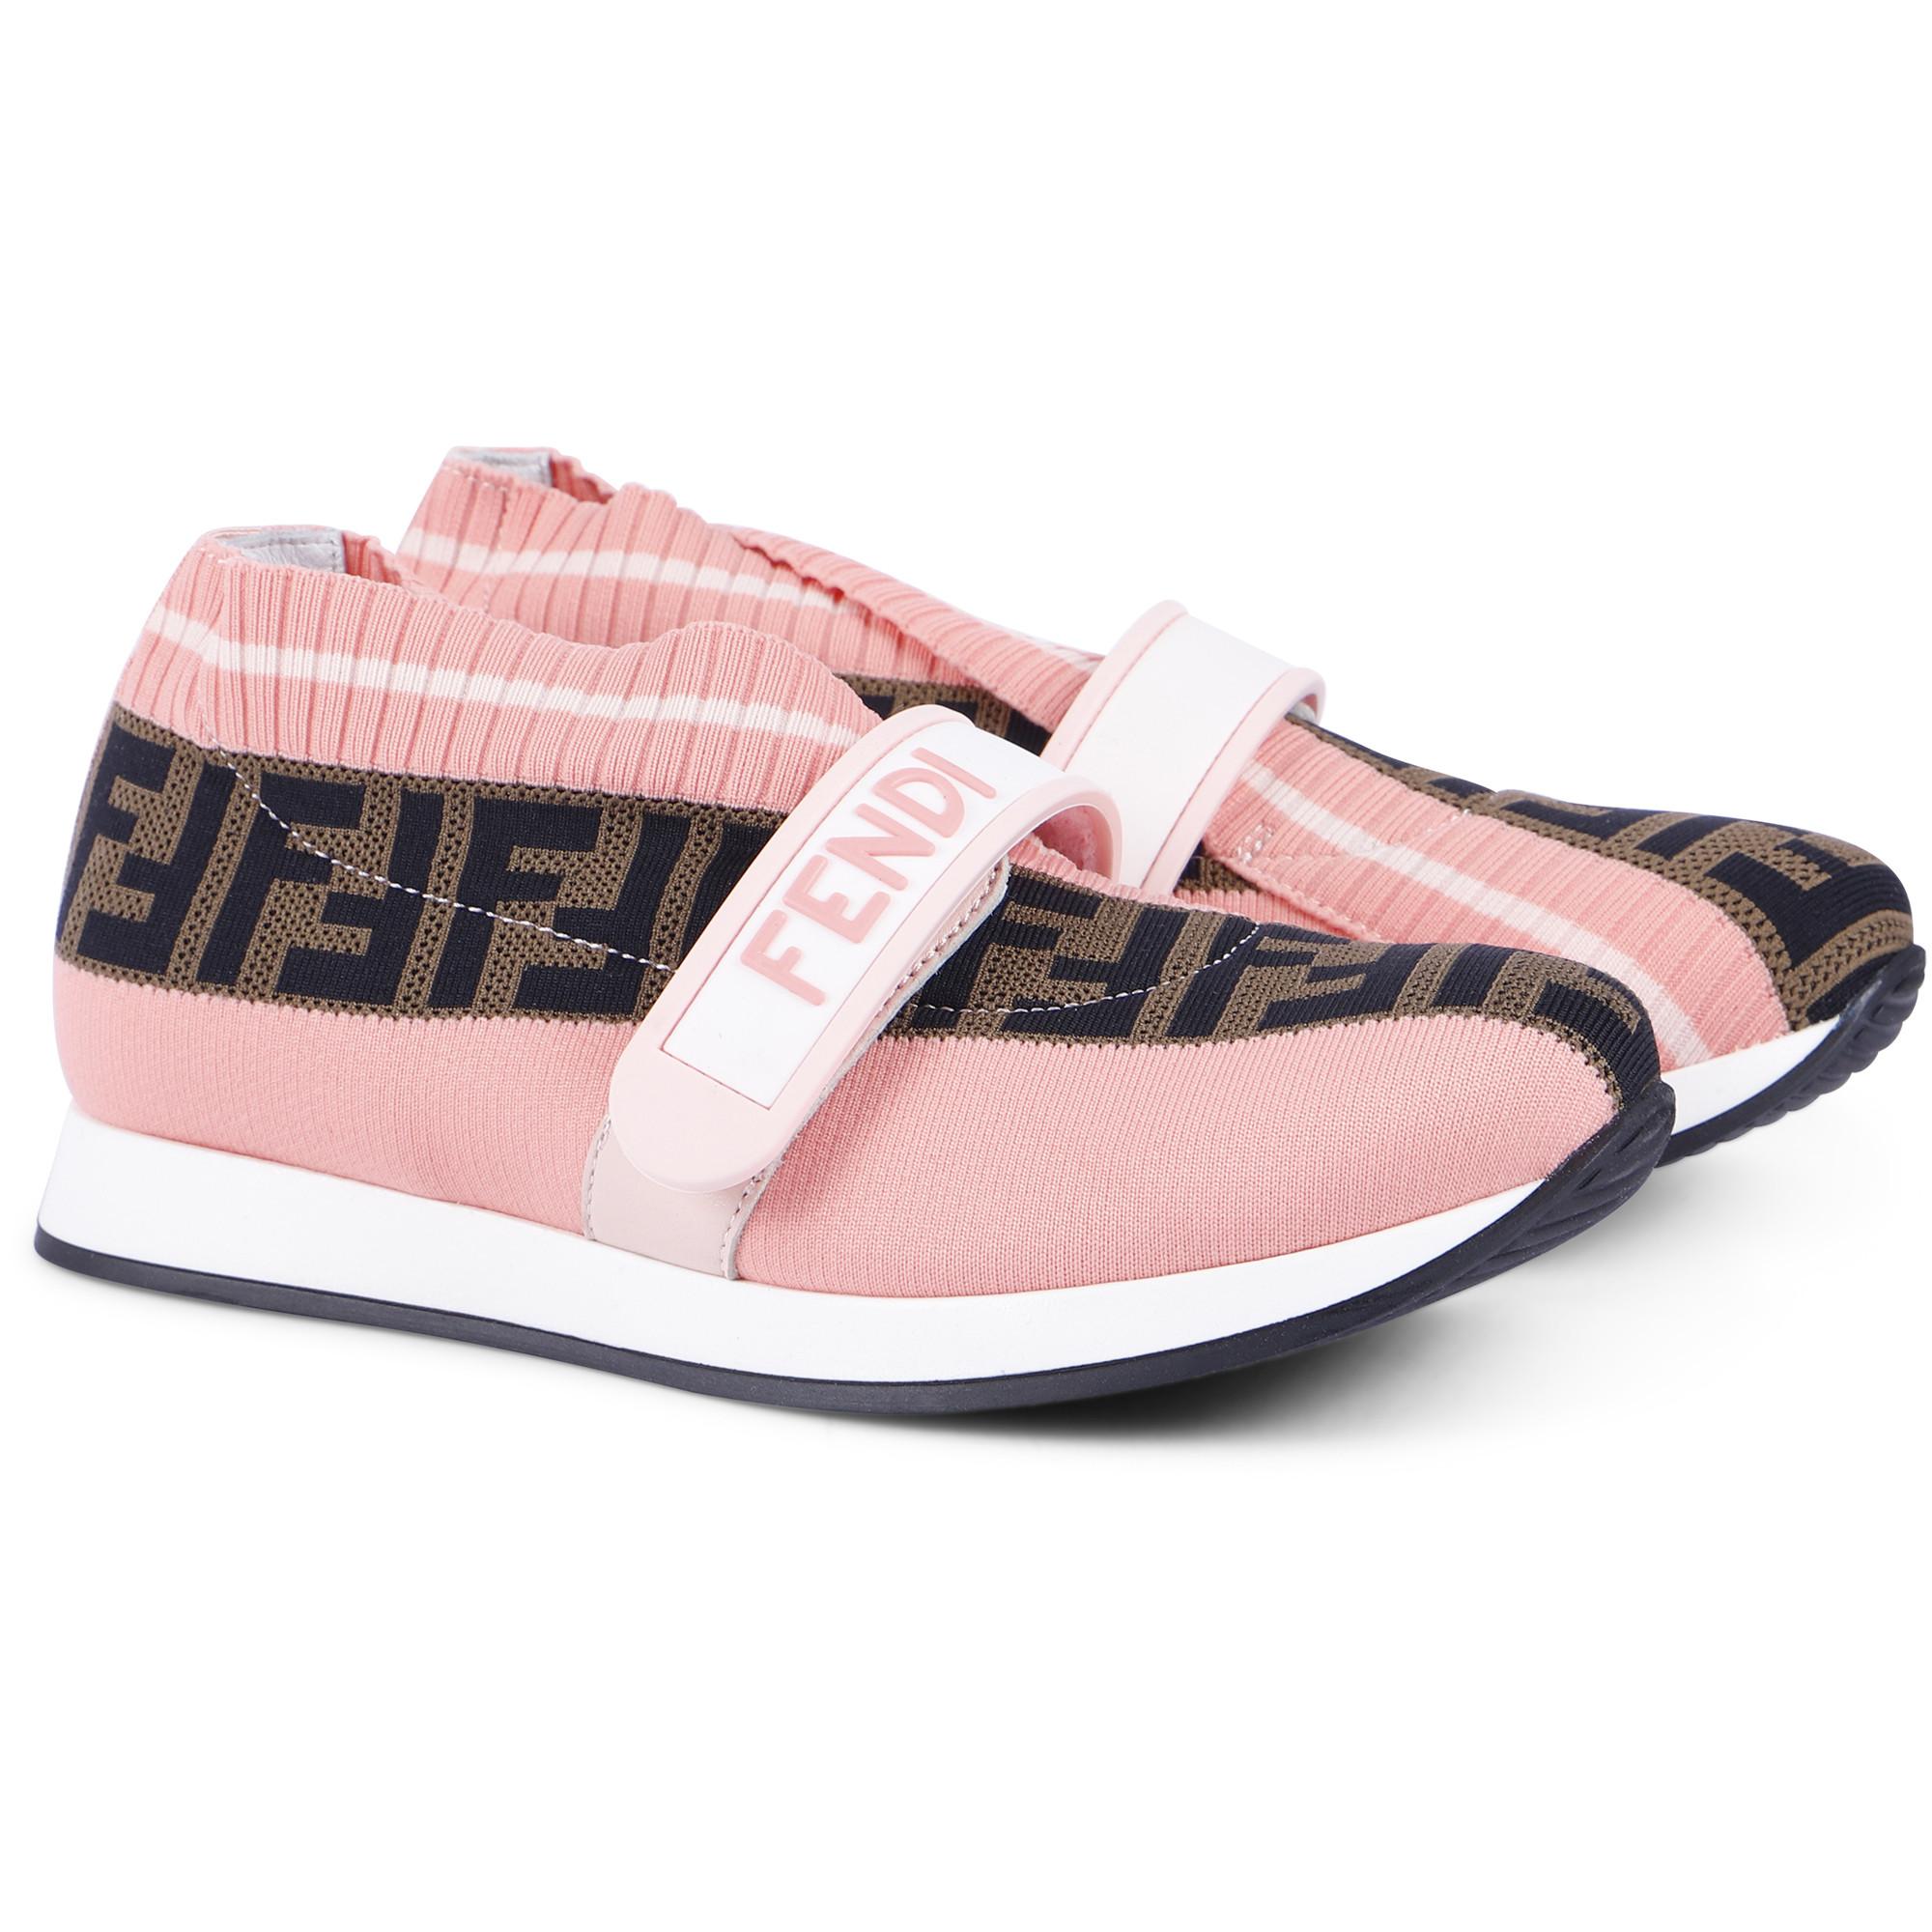 Fendi FF Fabric Sneakers in Pink